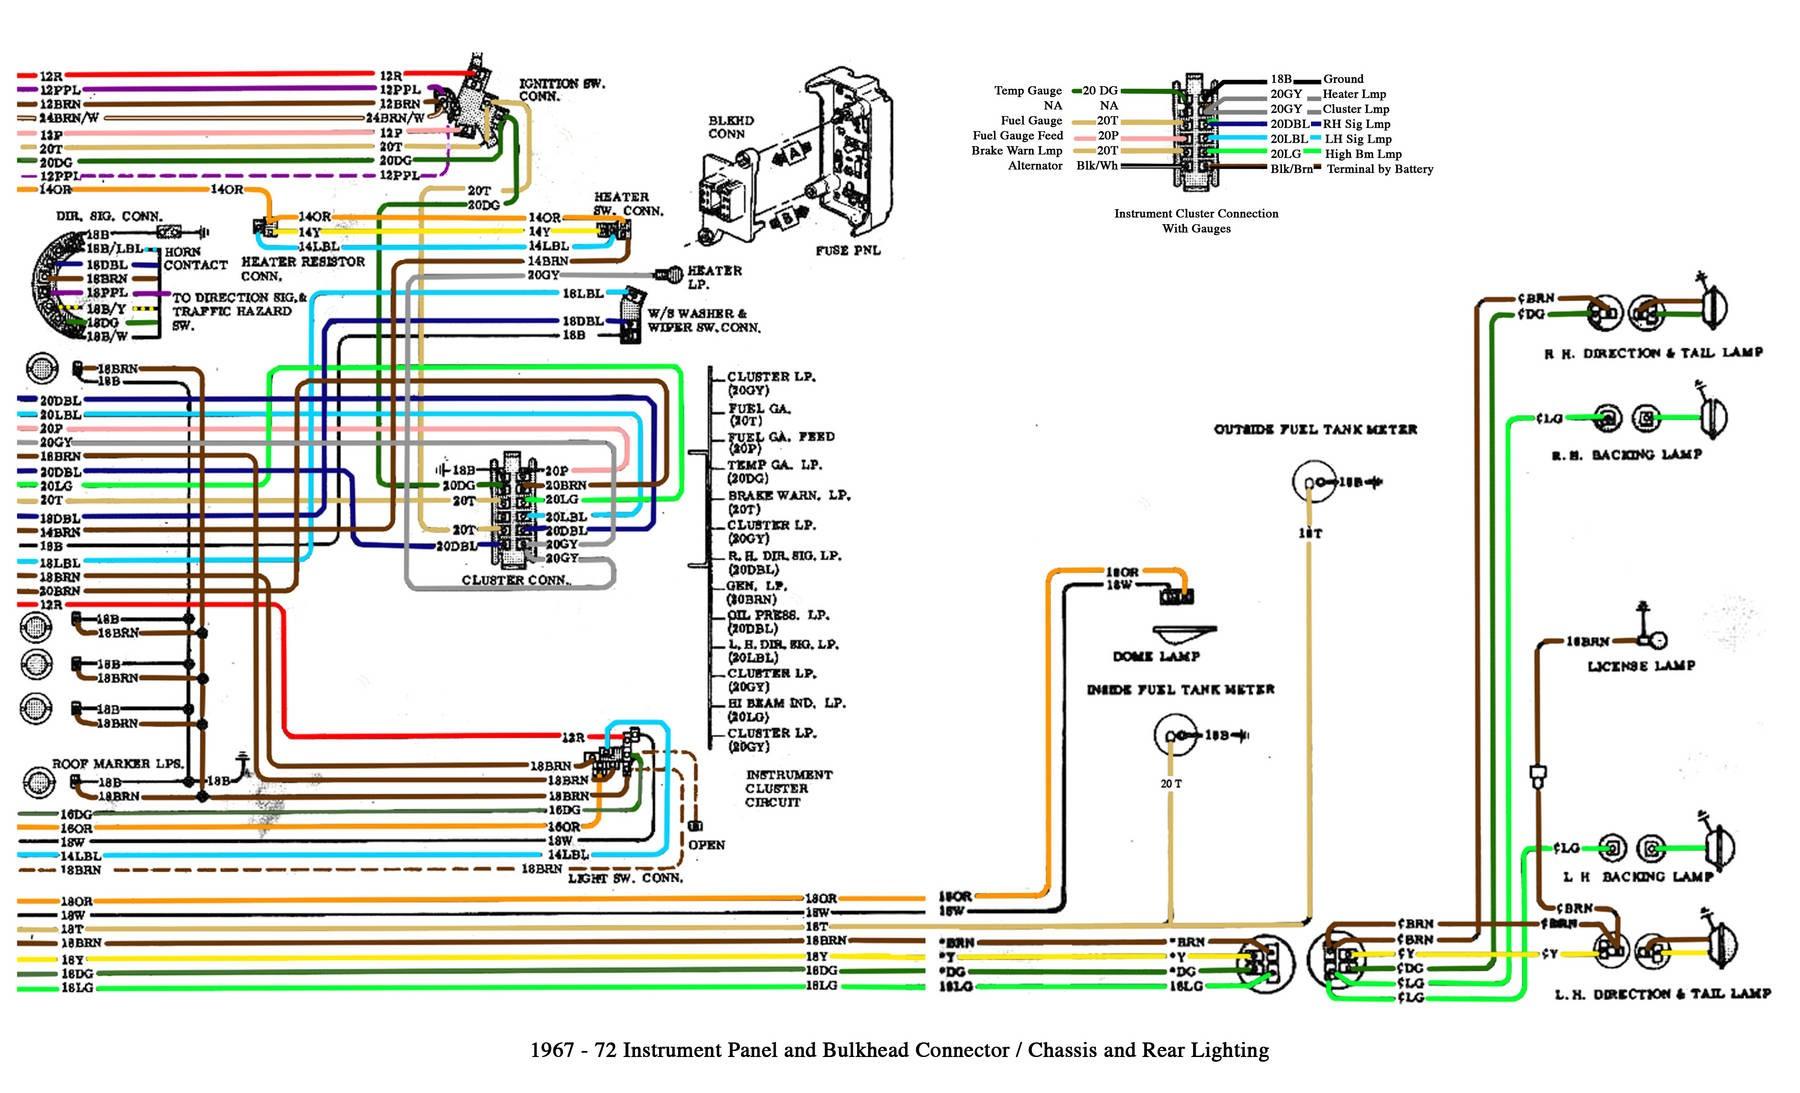 1995 chevy cheyenne wiring diagram wiring diagrams schematics 1956 chevy pickup wiring diagram 1995 chevy silverado